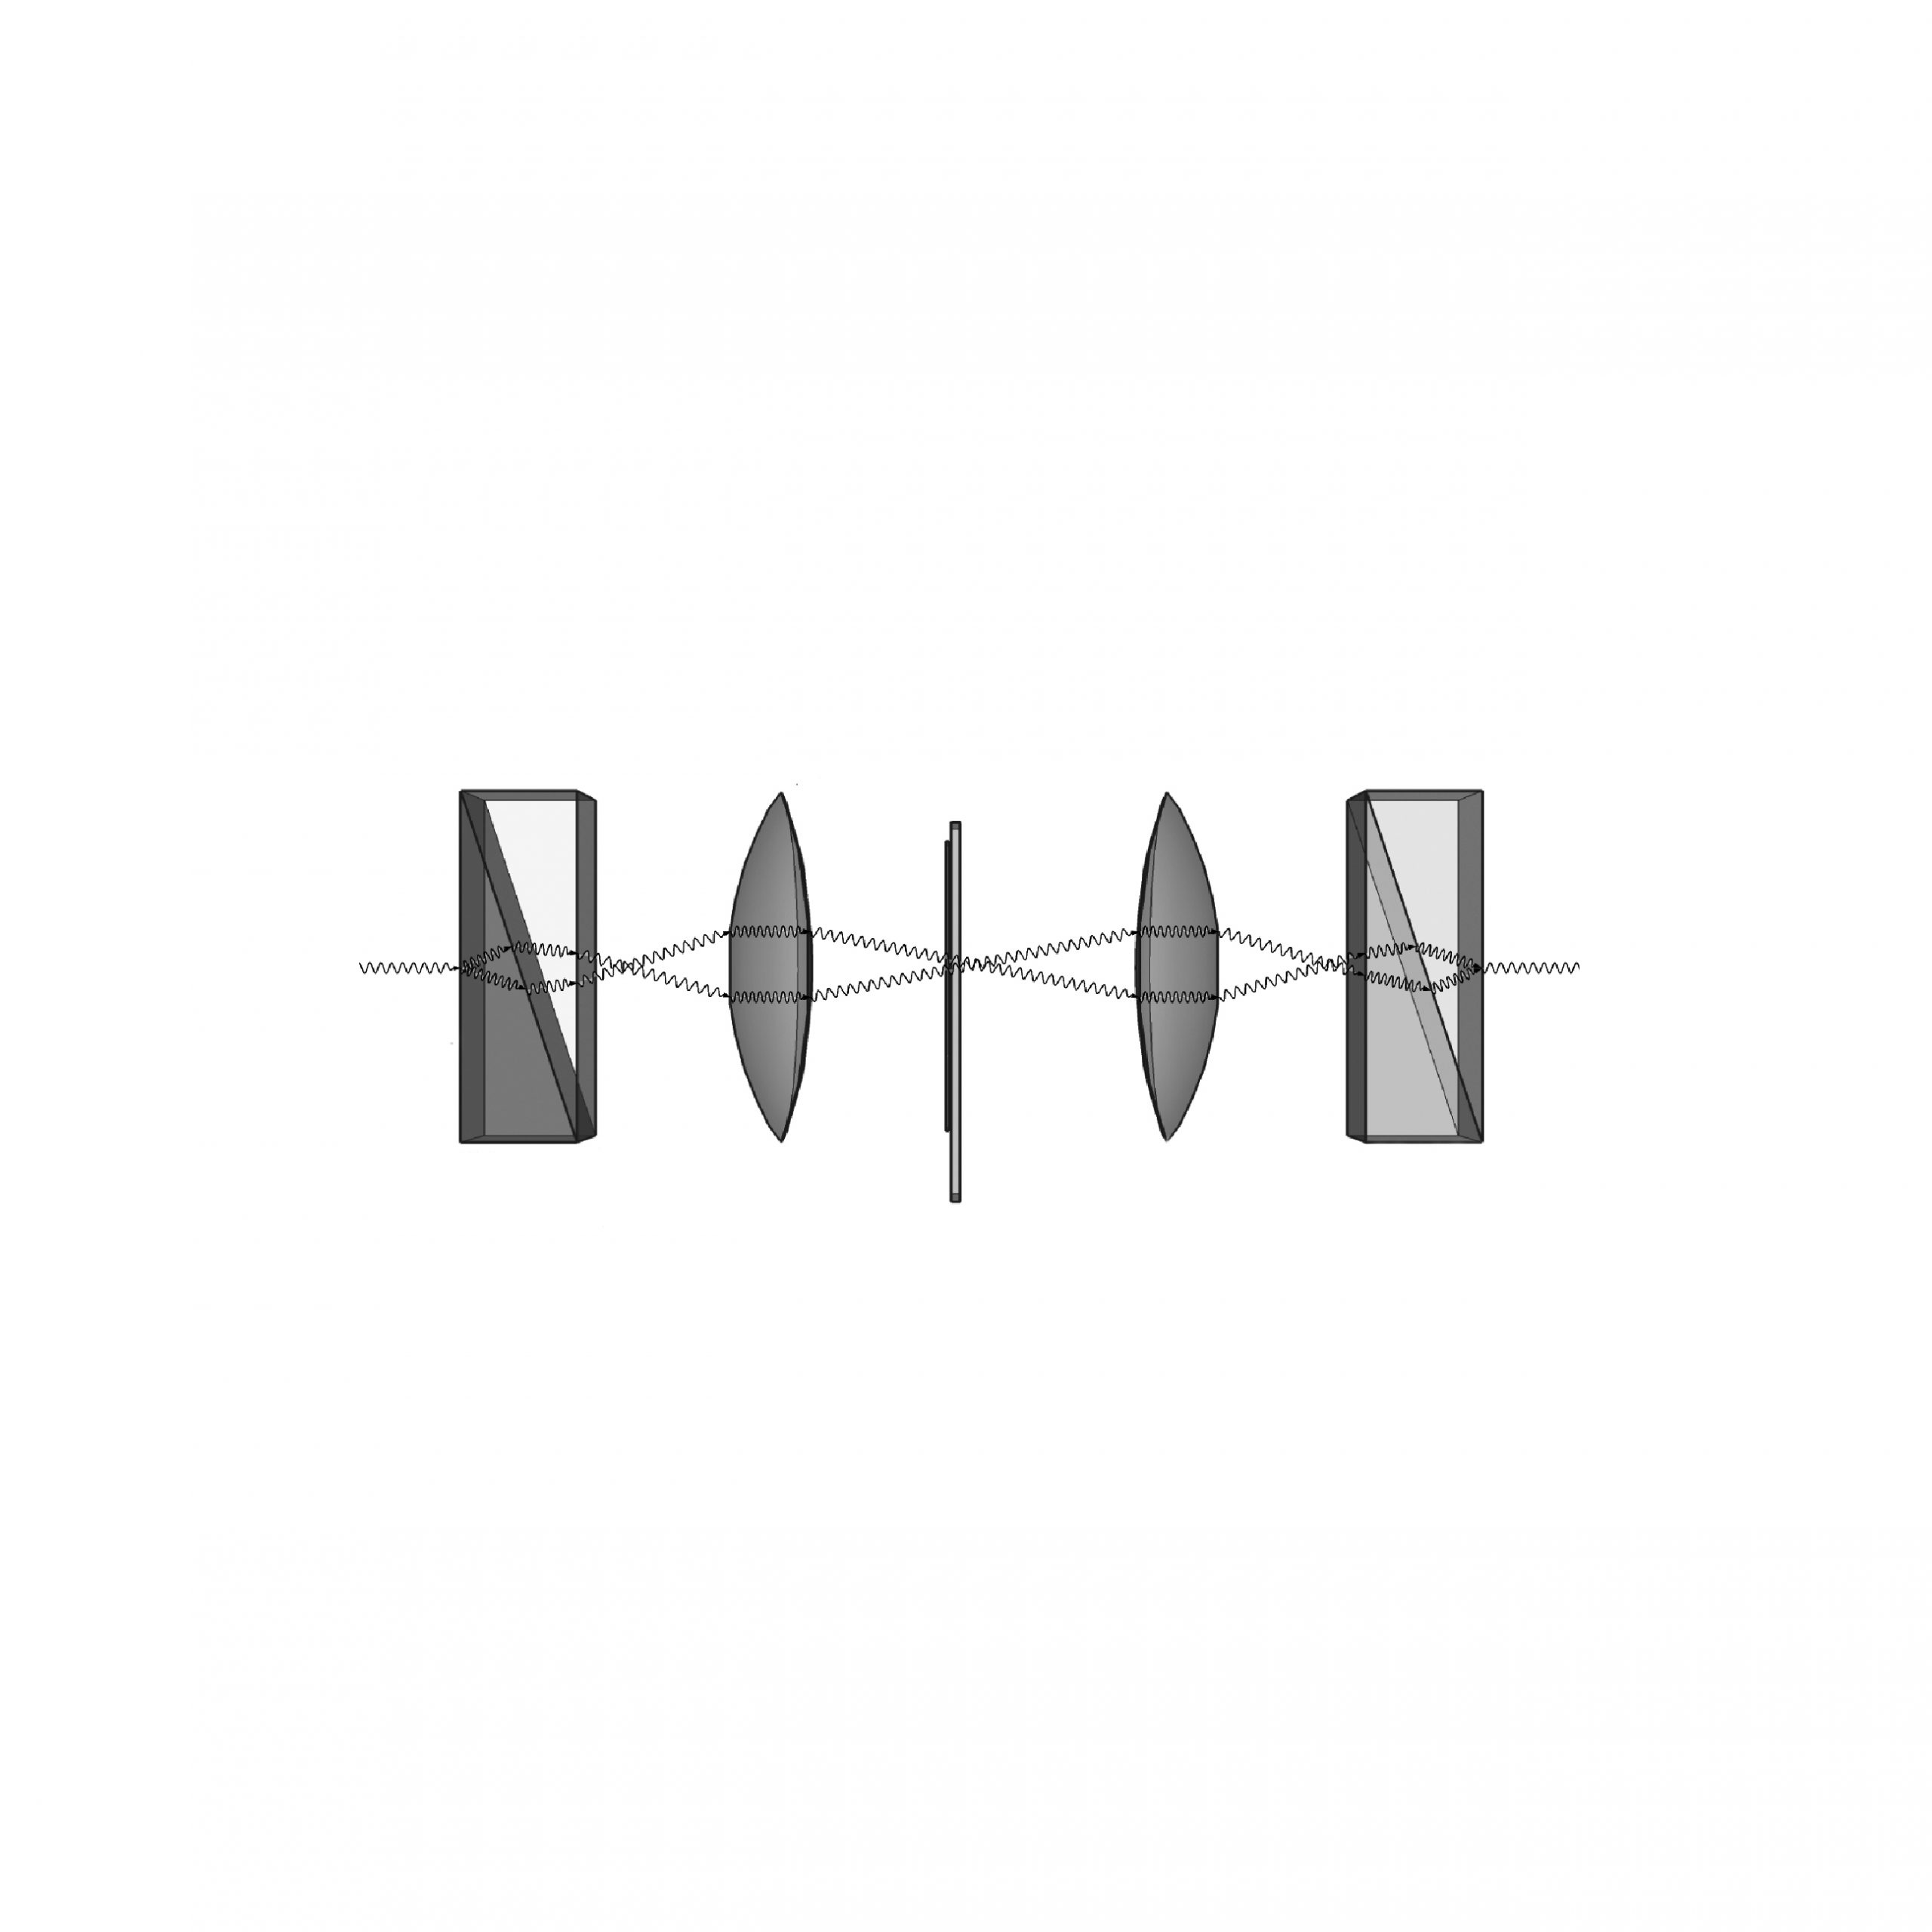 Bitflow-studio-logo-scientific-project-qmic-concept